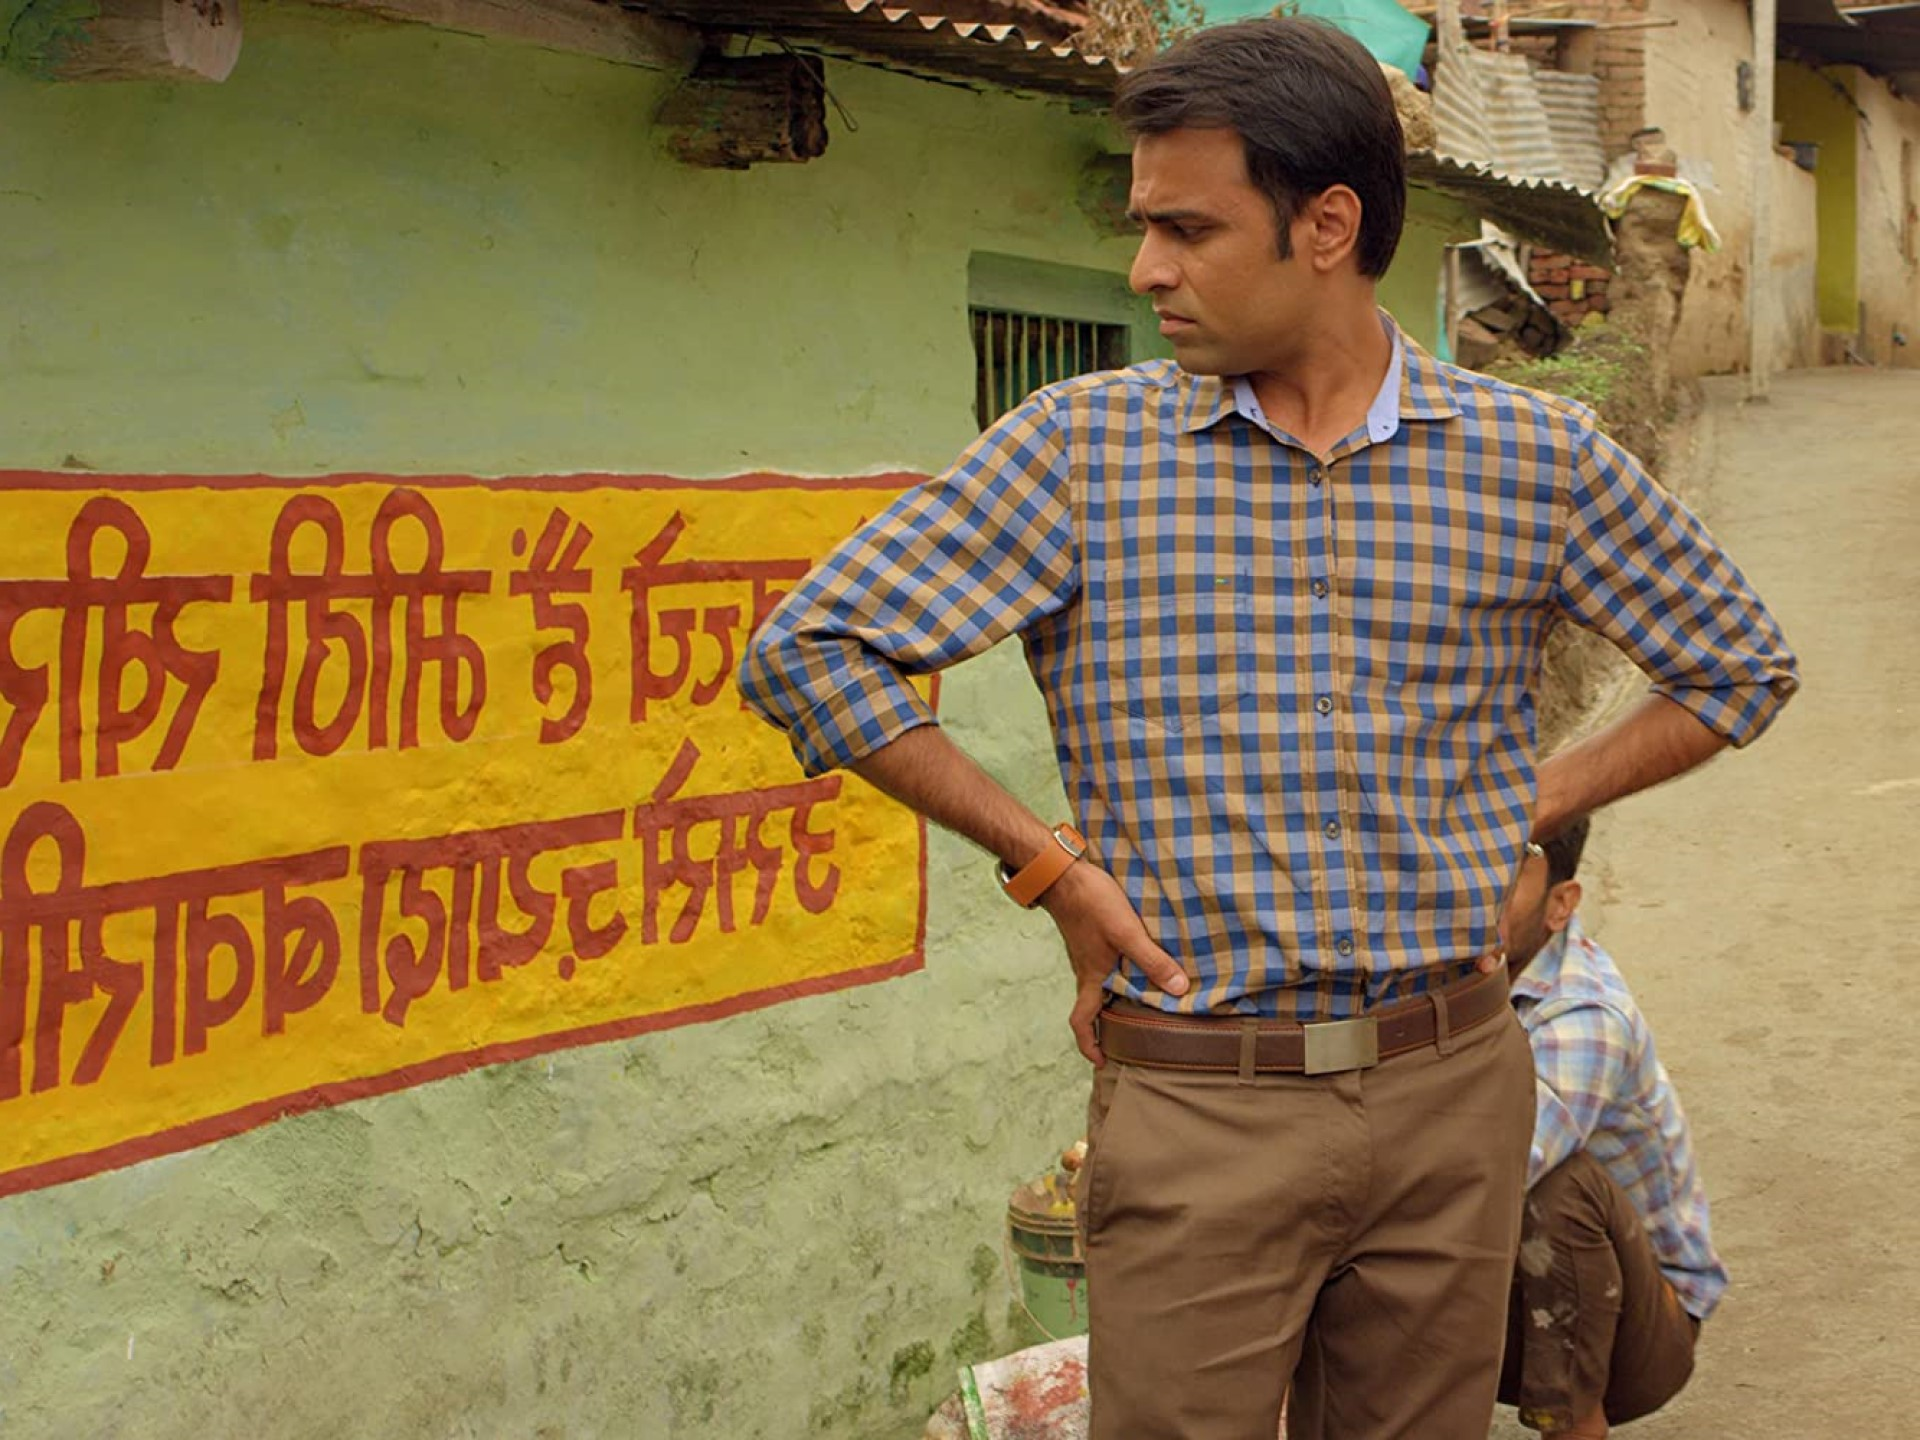 Amazoncom Watch Panchayat   Season 1 Prime Video 1920x1440